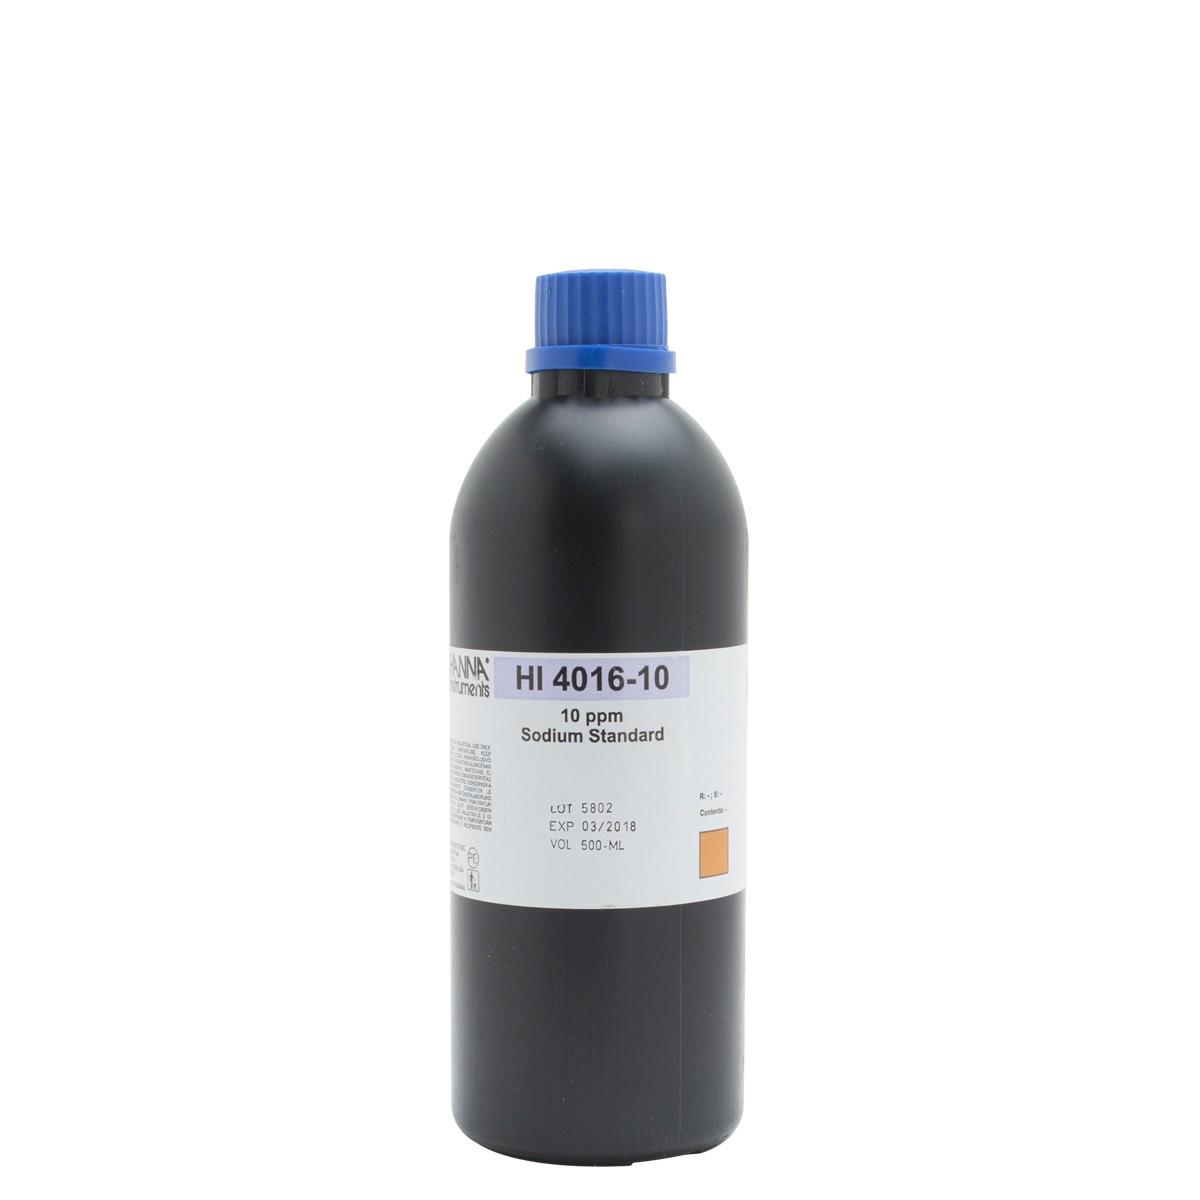 Sodium ISE 10 ppm Standard - HI4016-10